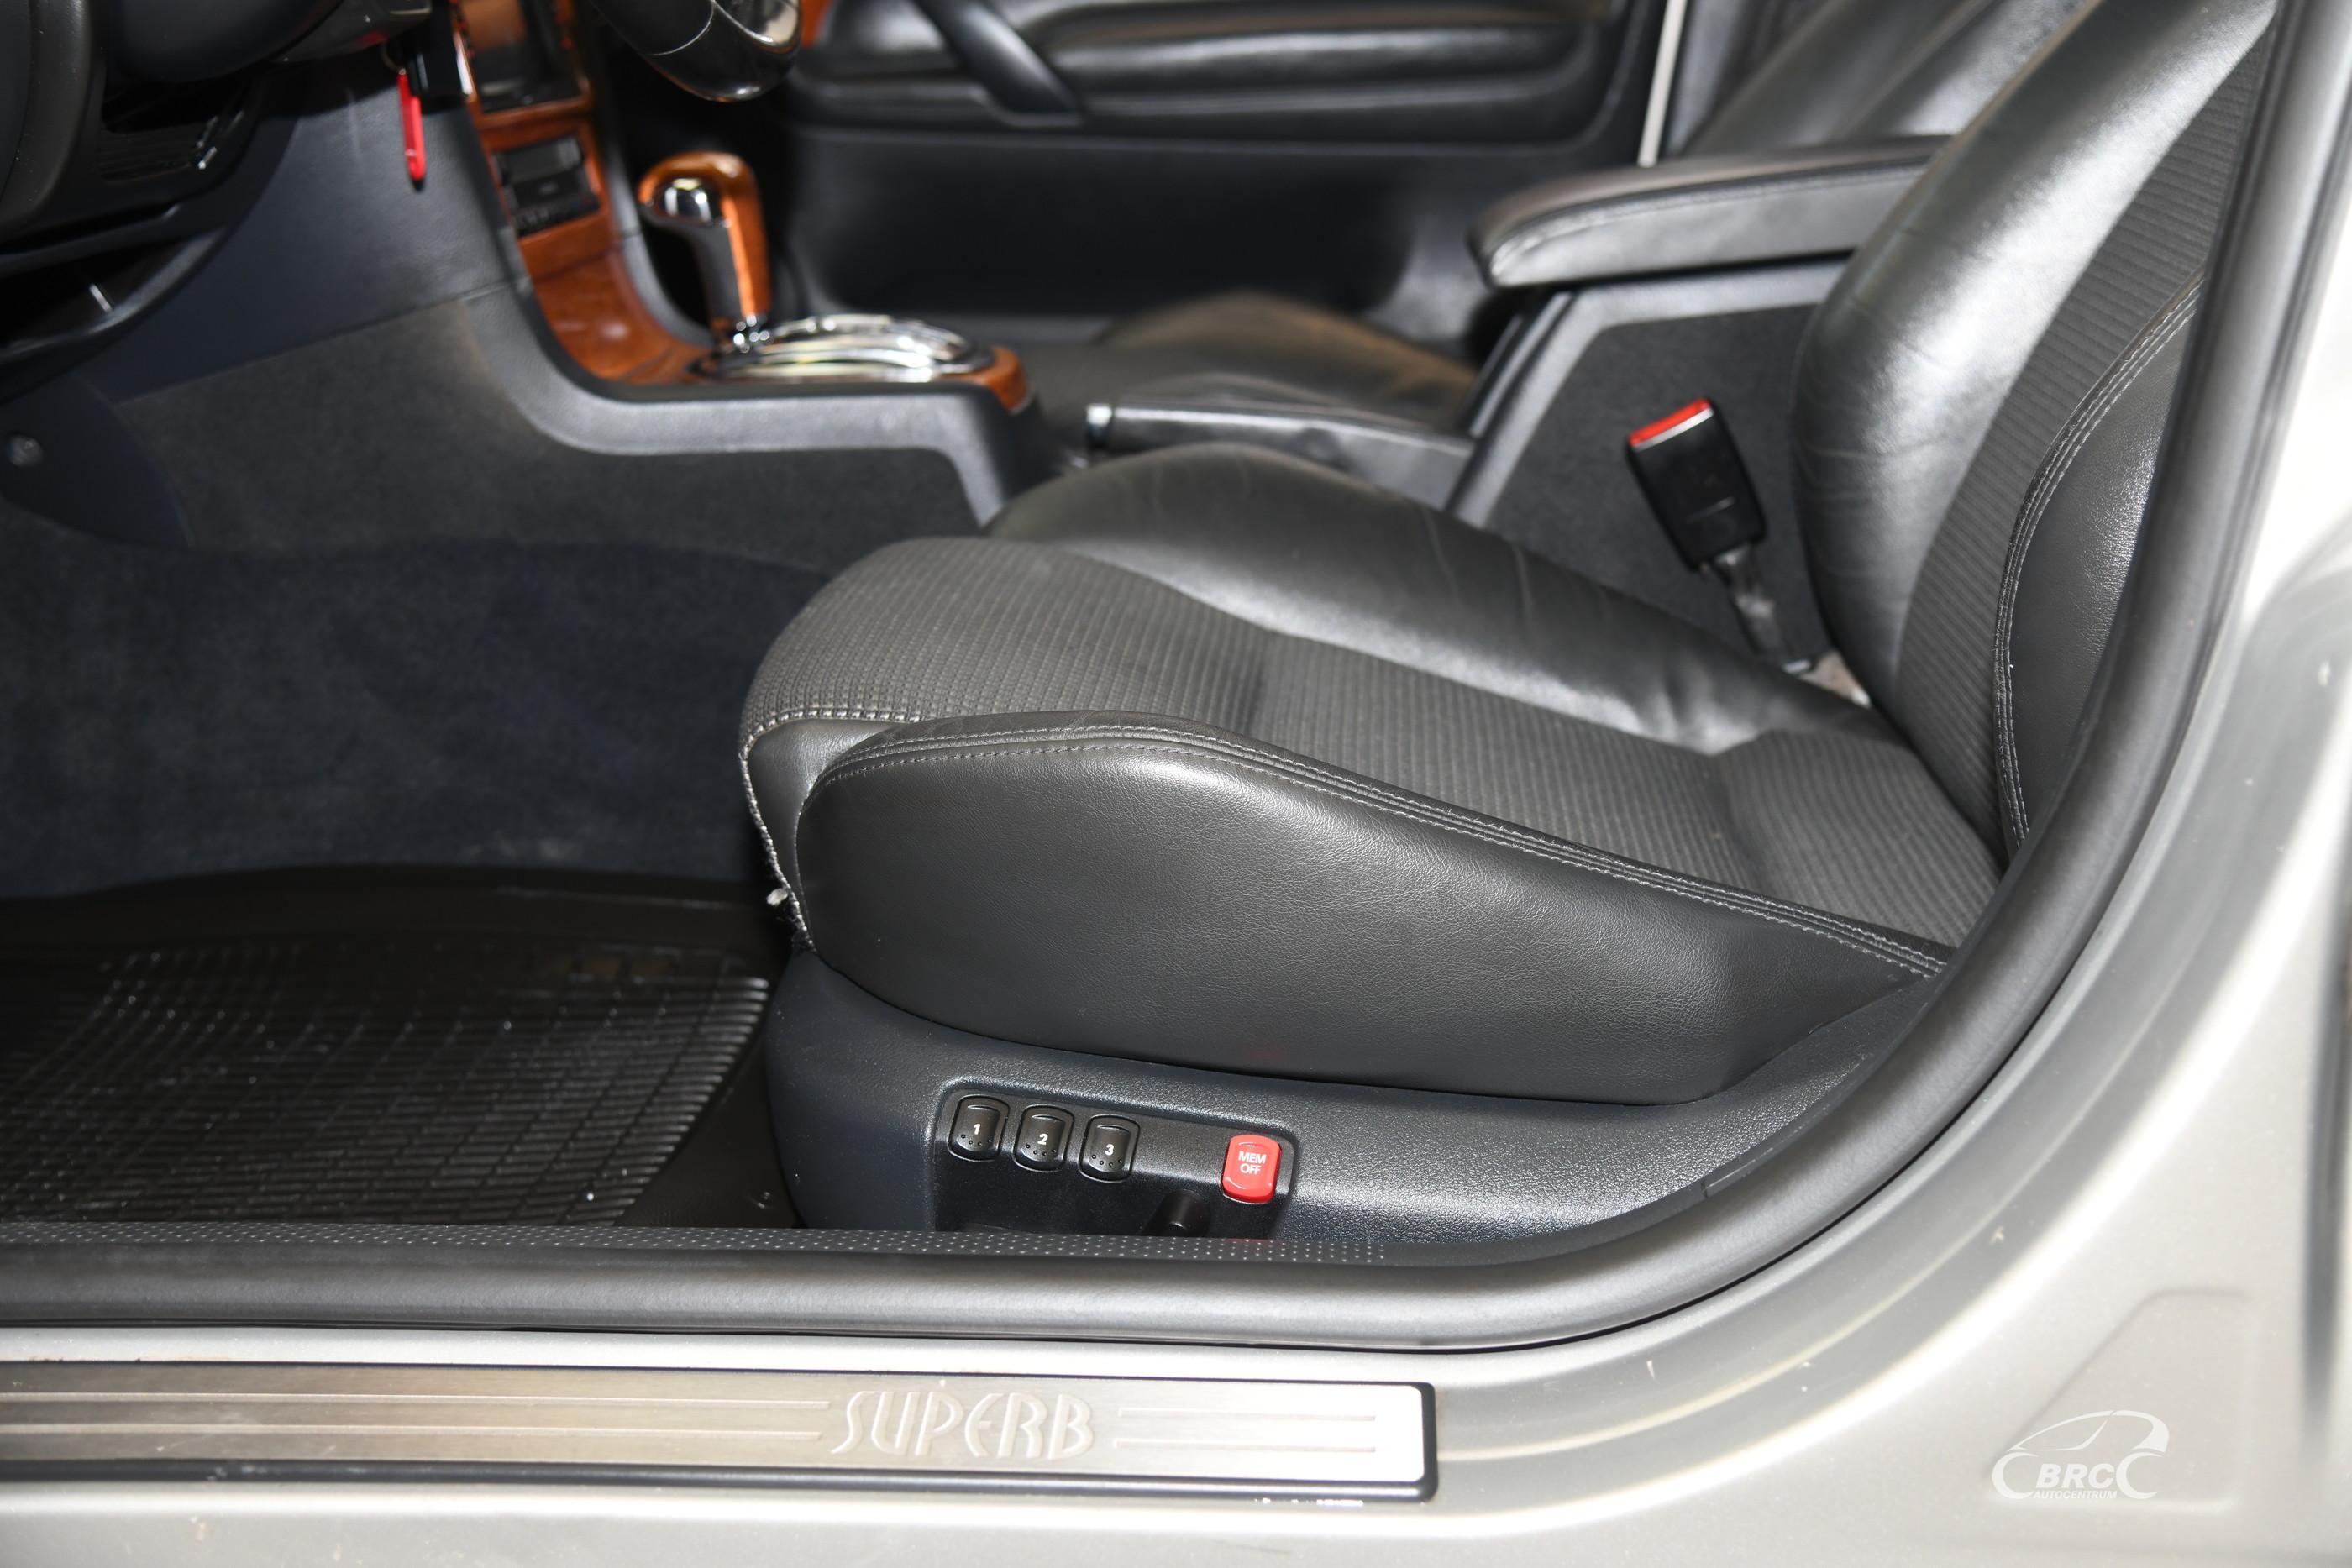 Skoda Superb 2.5 TDI V6 Automatas